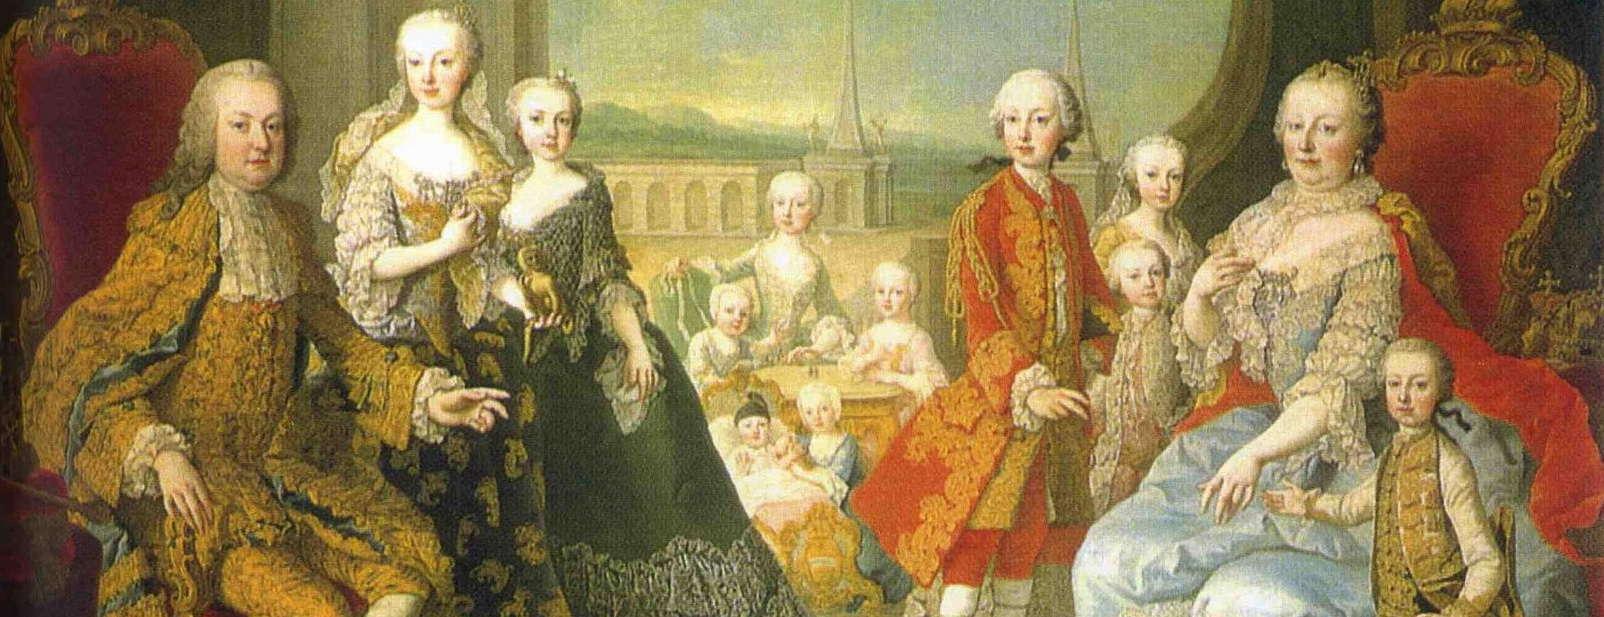 Habsburger i Wien Franz I. Stephan und Maria Theresia Semester i Wien Österrike